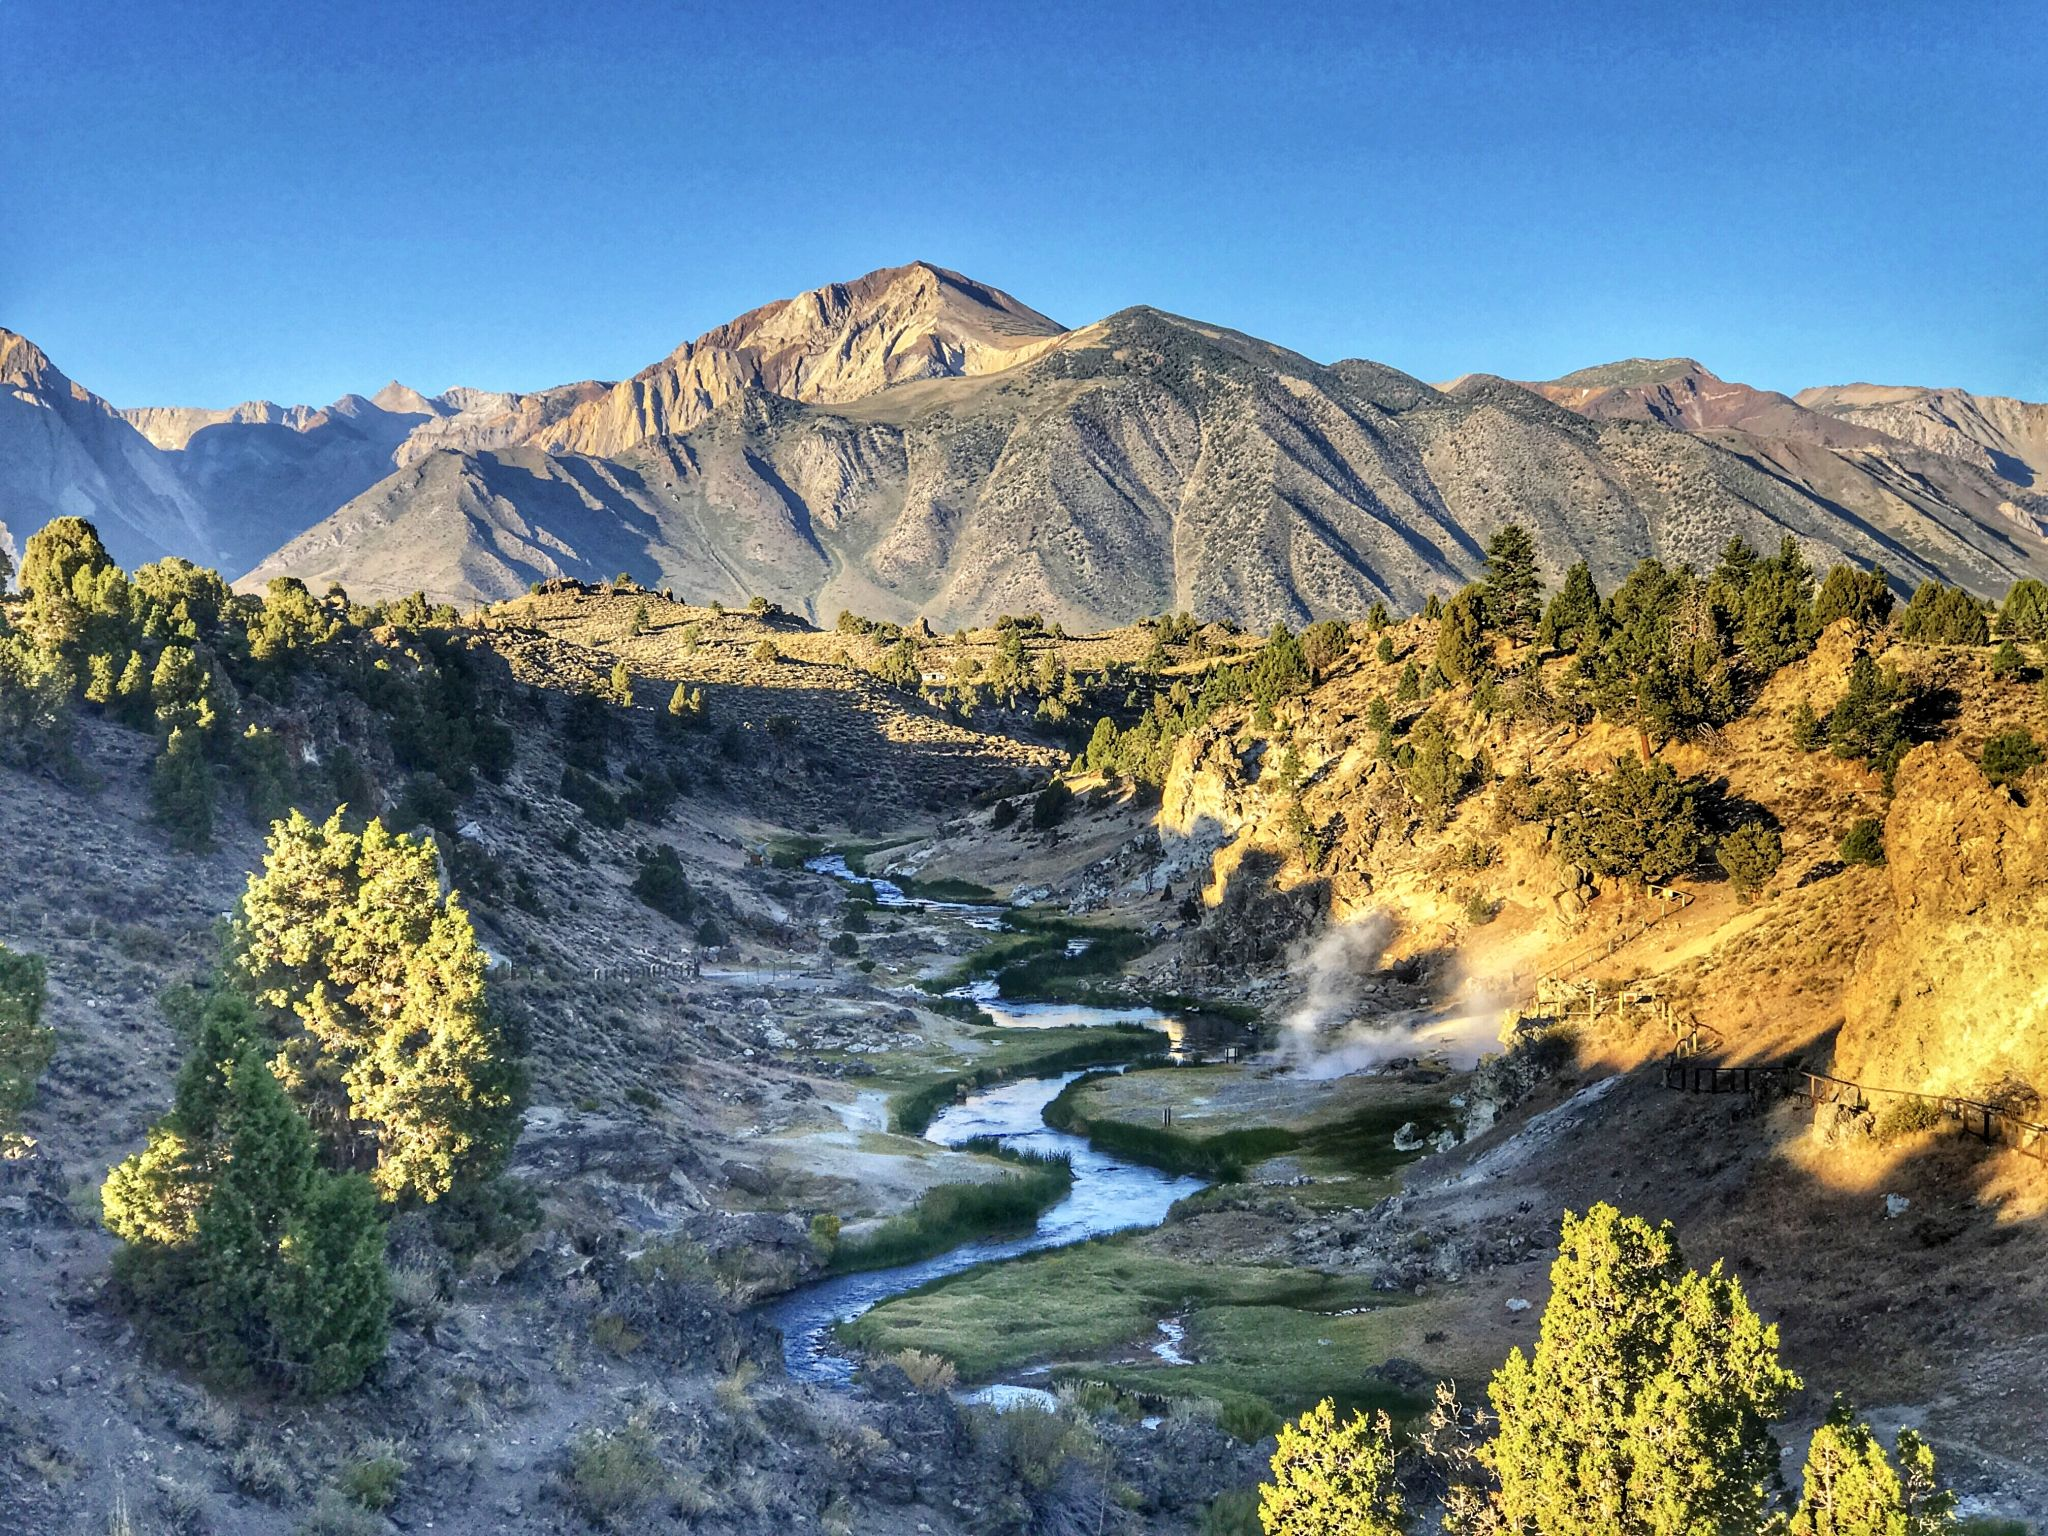 Hot Creek, Mammoth Lakes, CA, USA